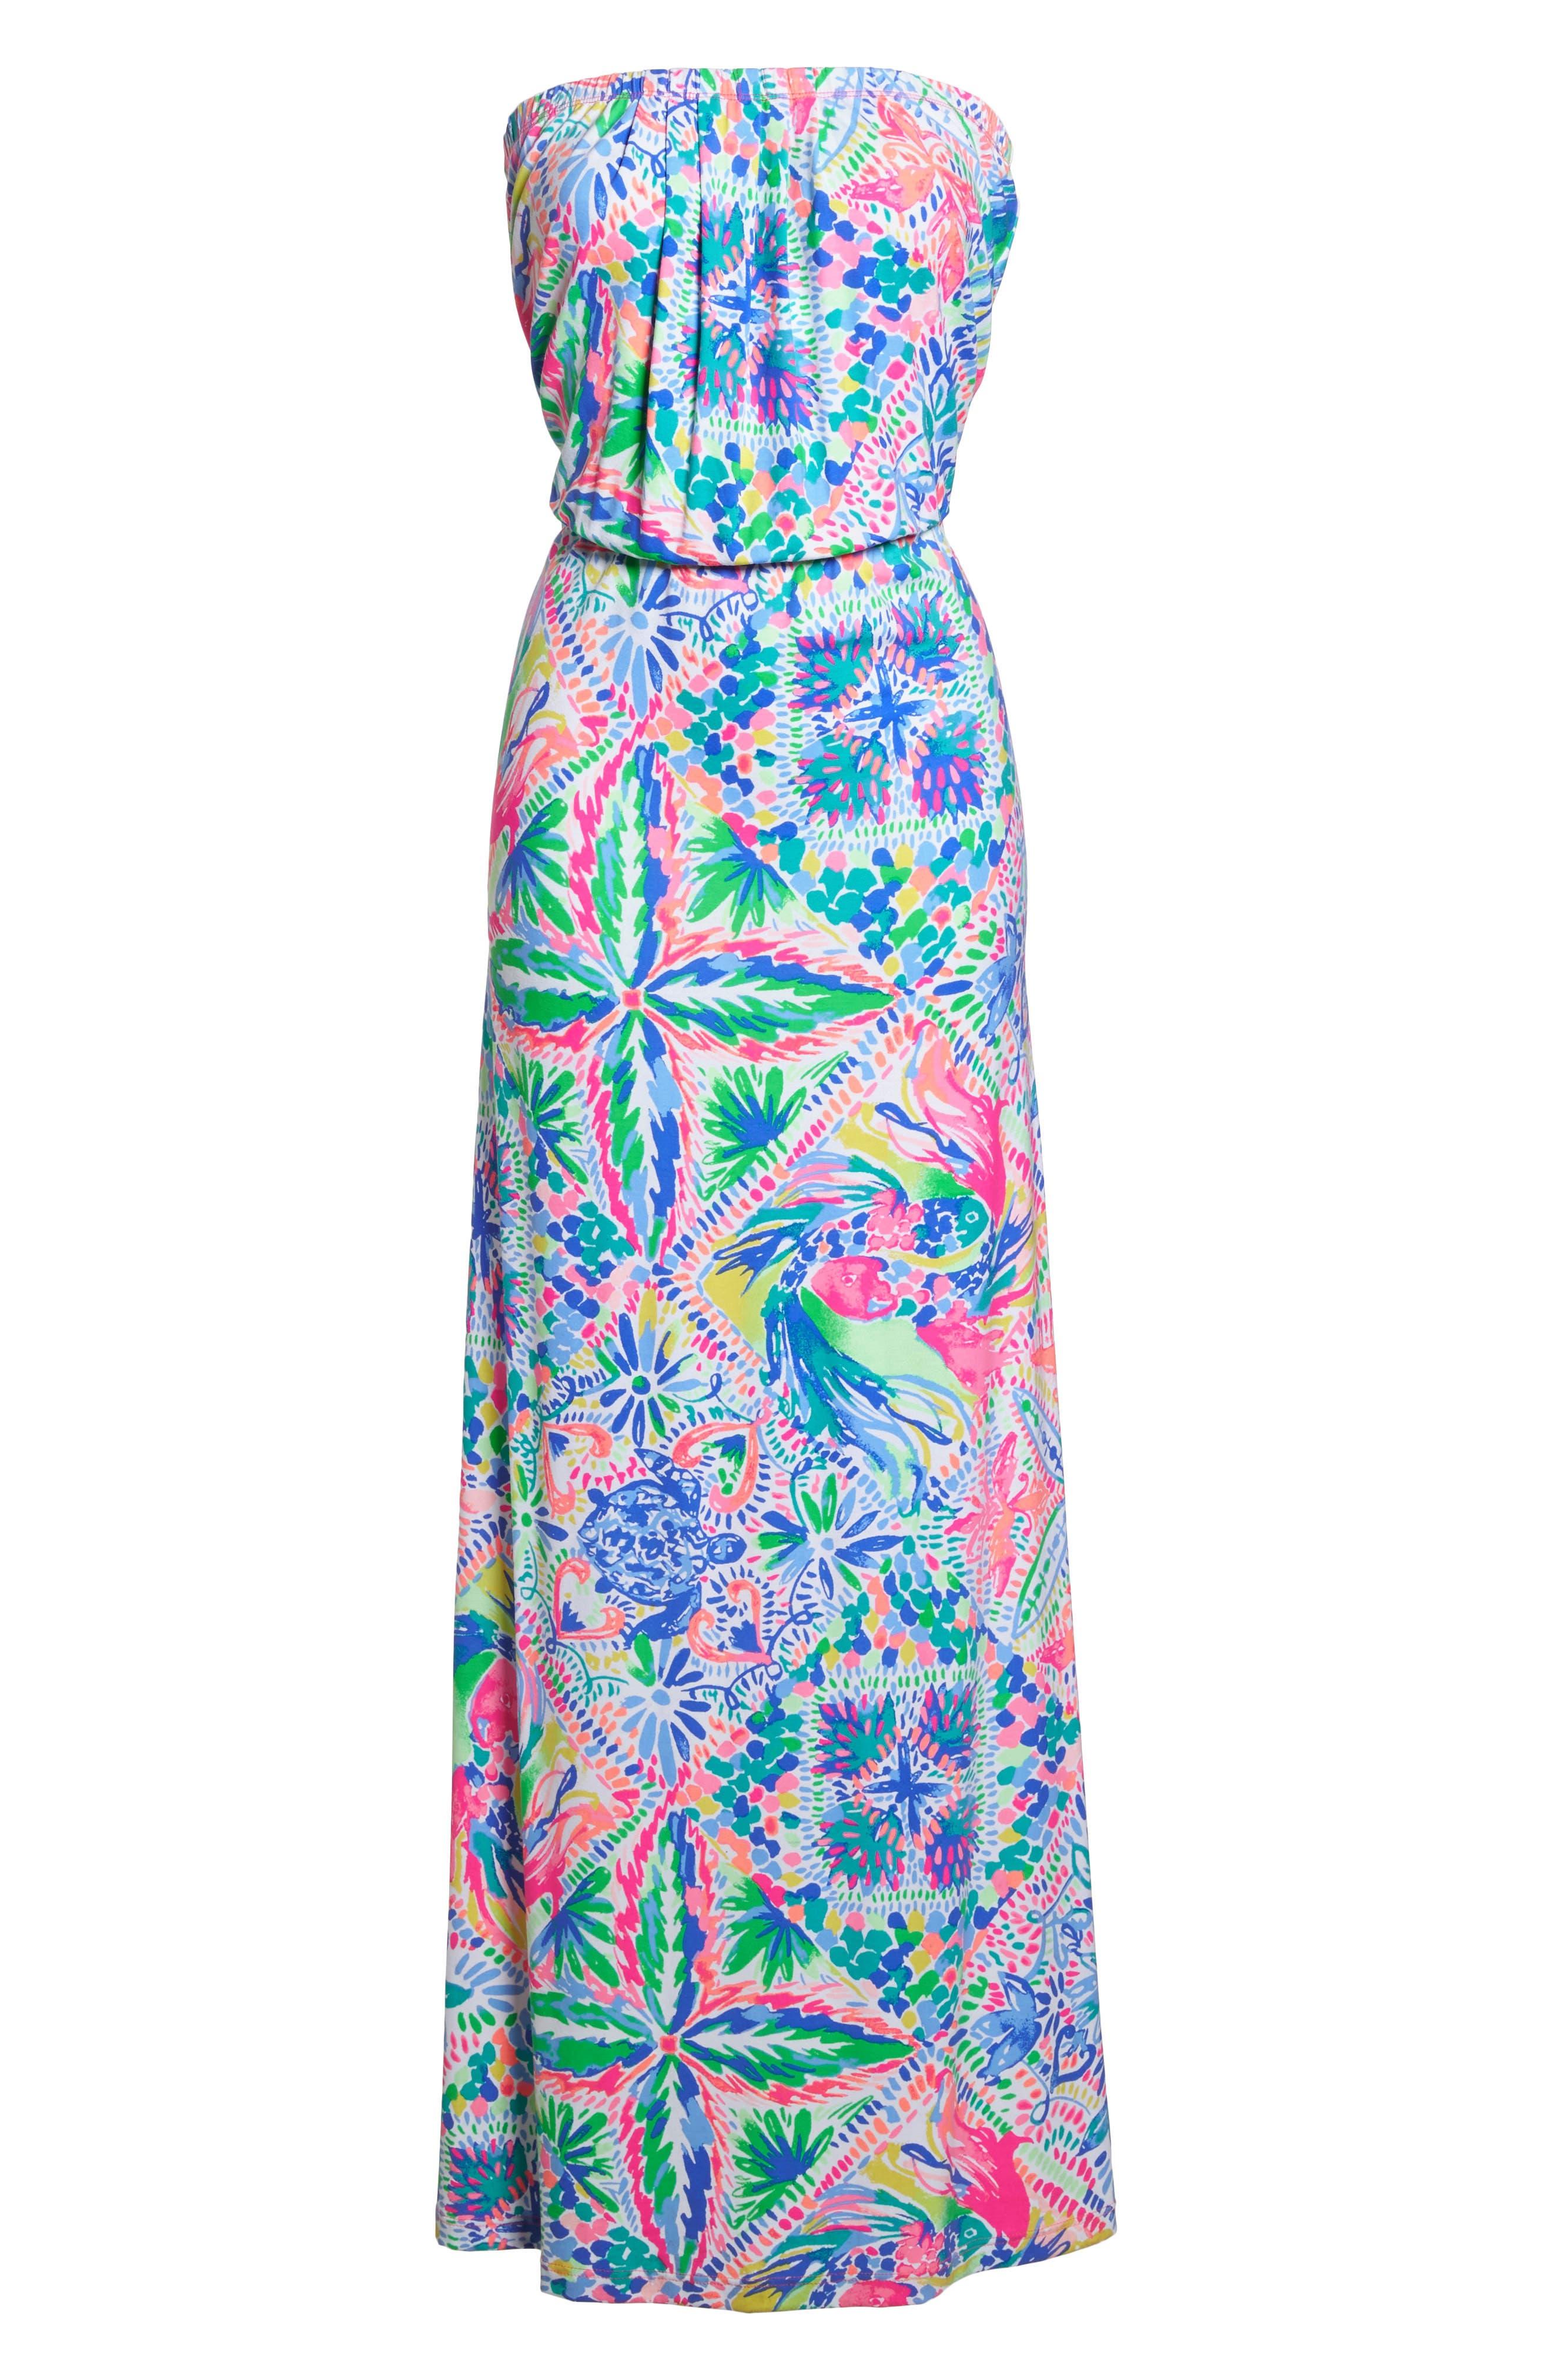 Marlisa Maxi Dress,                             Alternate thumbnail 7, color,                             MULTI DANCING ON THE DECK